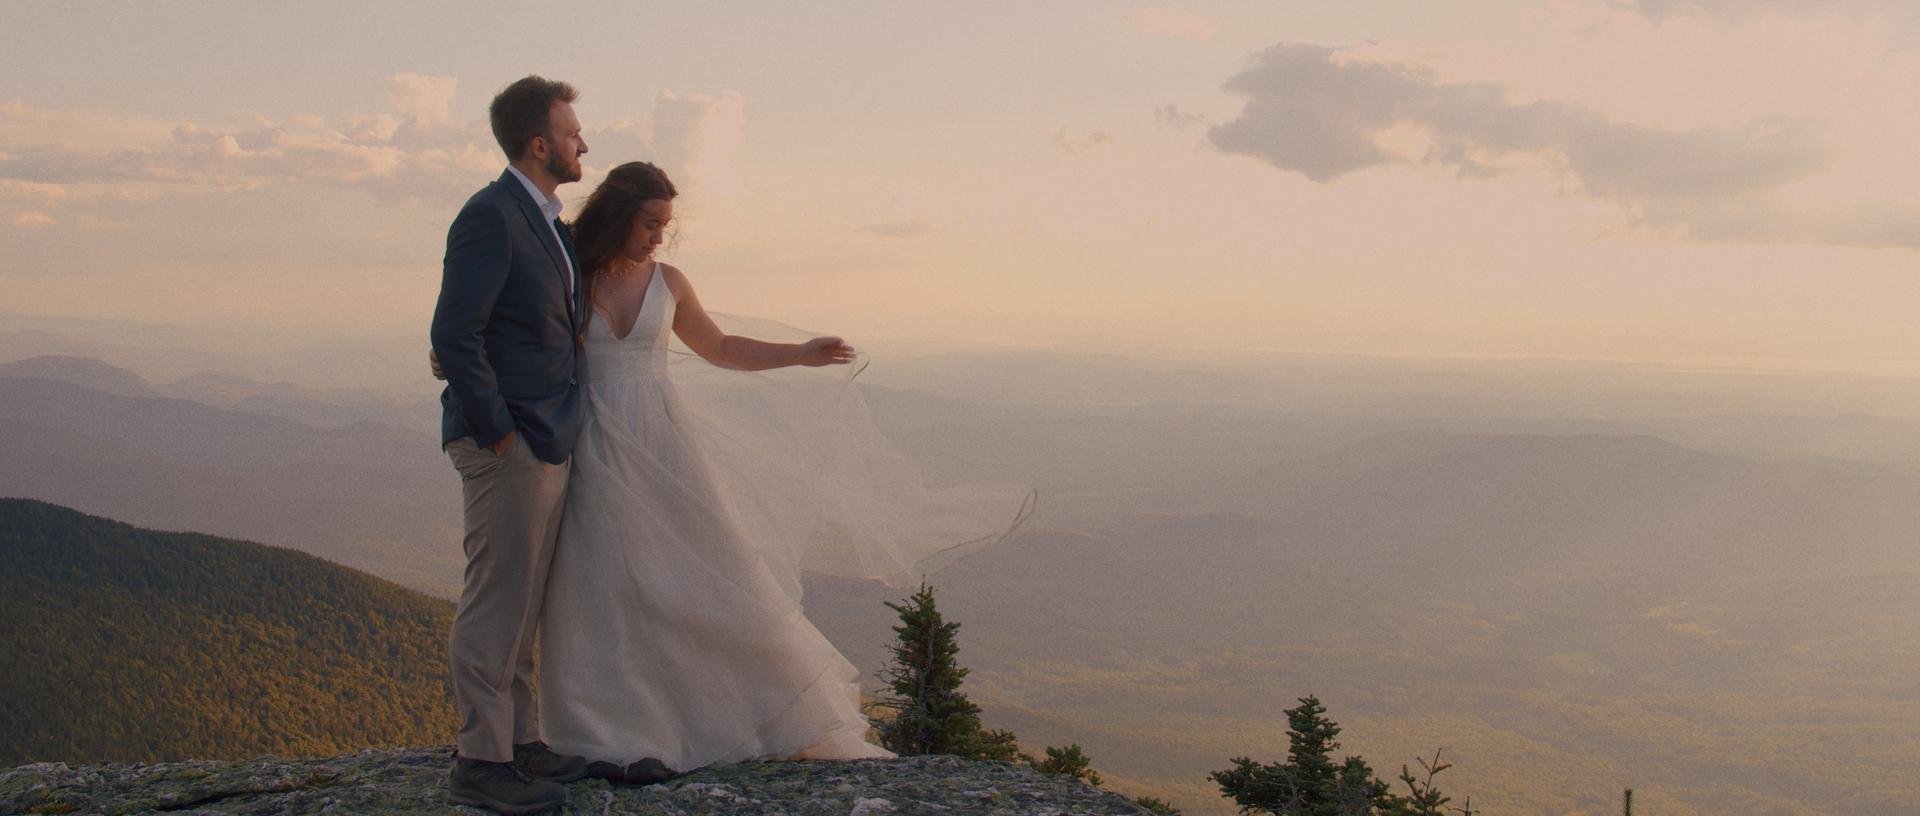 Lauren + Nick | Stowe, Vermont | Edson Hill